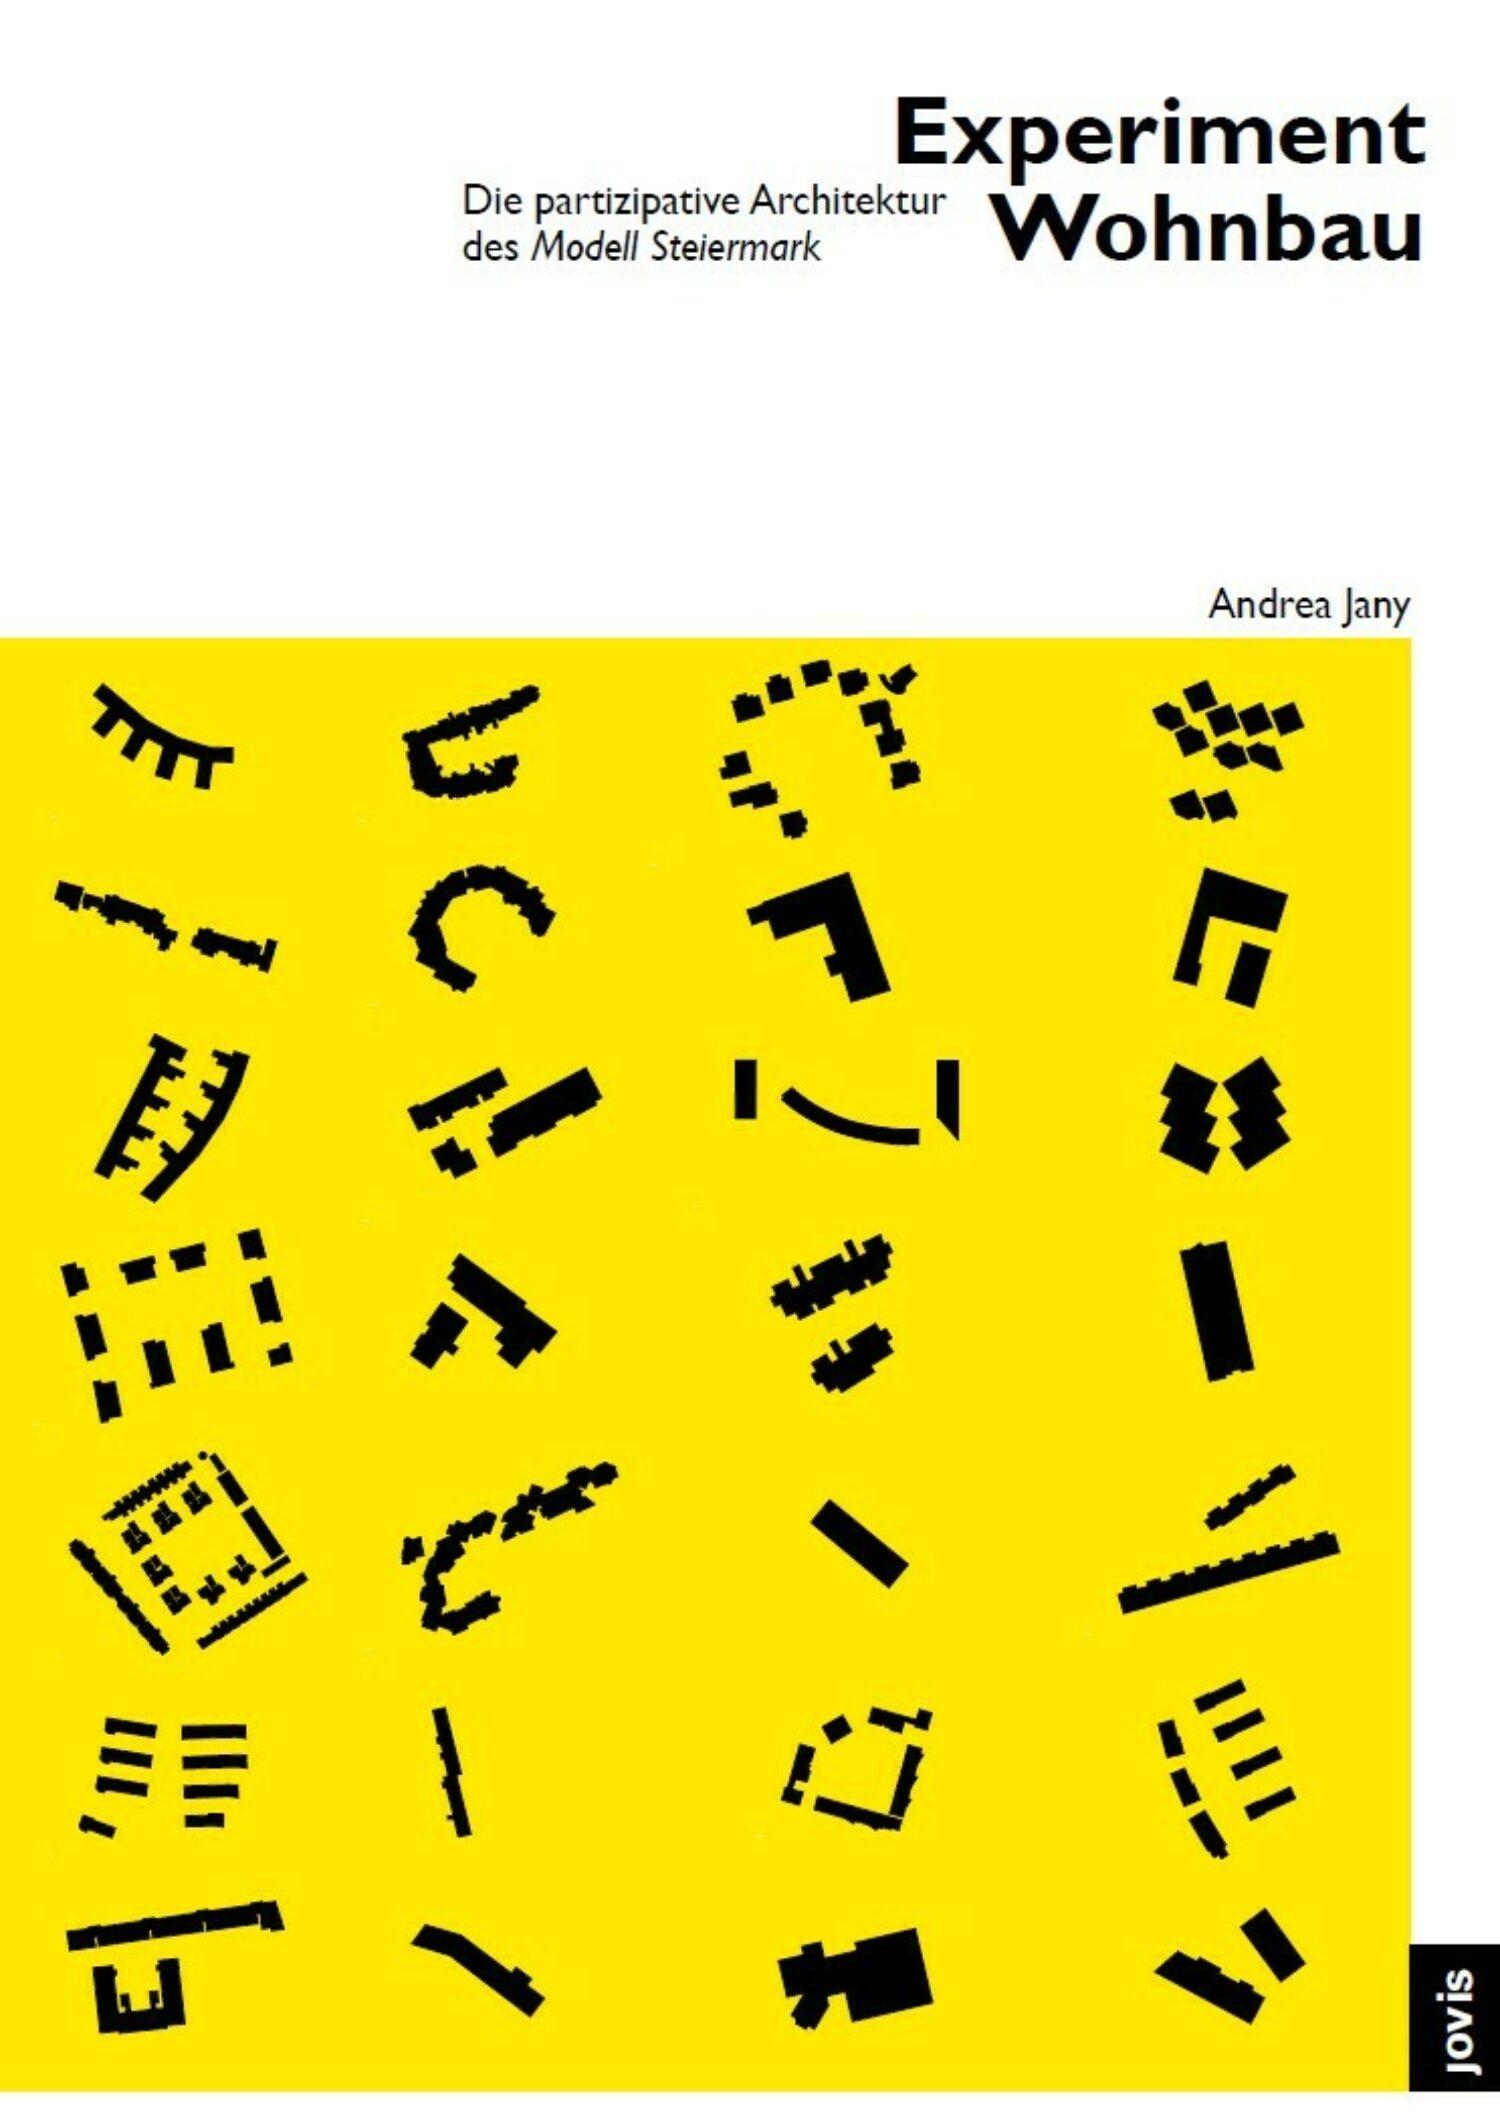 Andrea Jany: Experiment Wohnbau. Die partizipative Architektur des Modell Steiermark, 2019 © Andrea Jany und Jovis Verlag